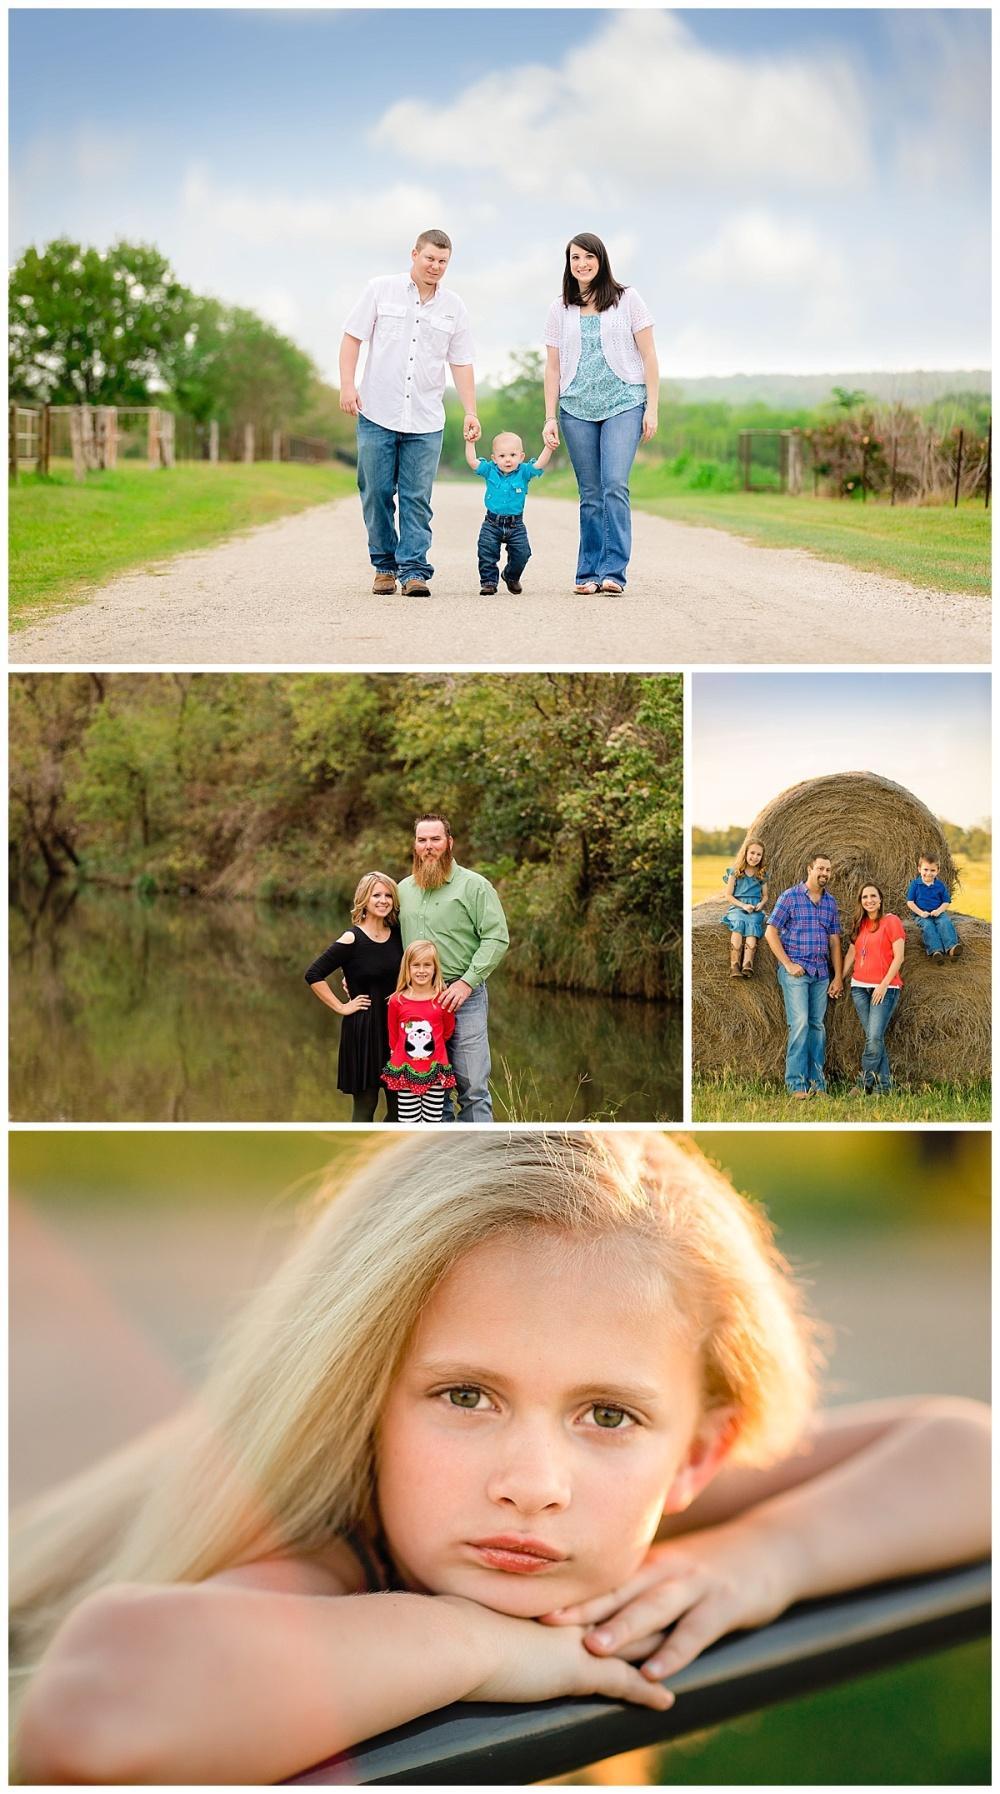 Carly-Barton-Photography-San-Antonio-Texas-Hill-Country-Fall-Heubaum_0135